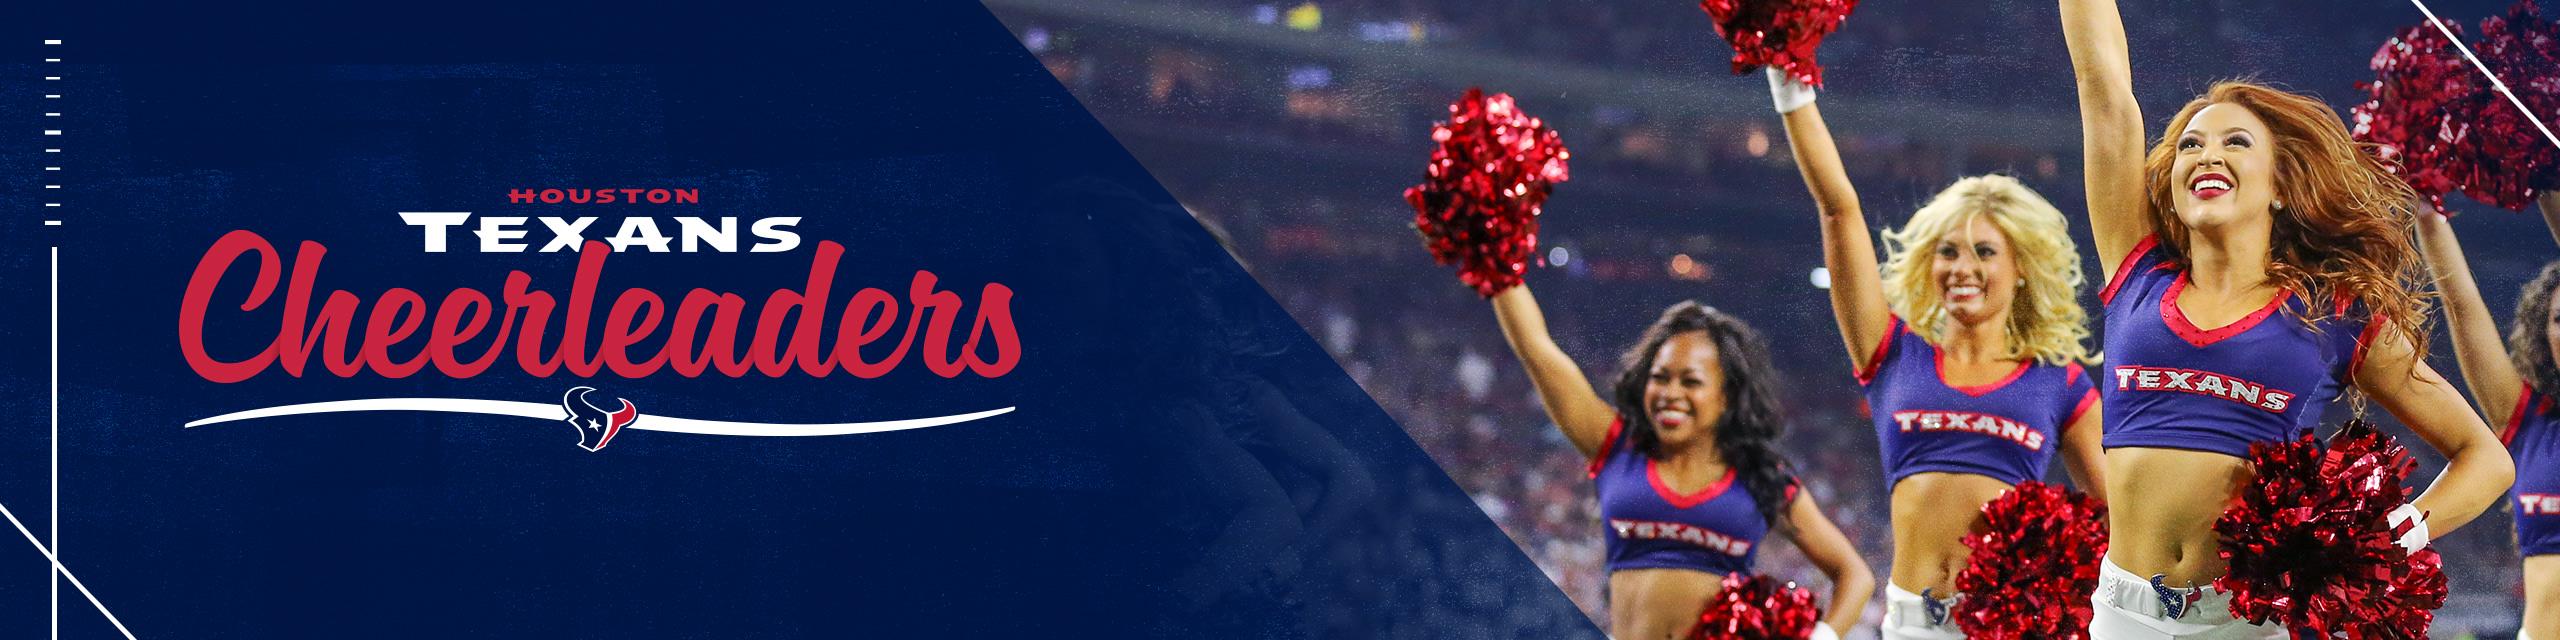 Texans Cheerleaders | Houston Texans - HoustonTexans com